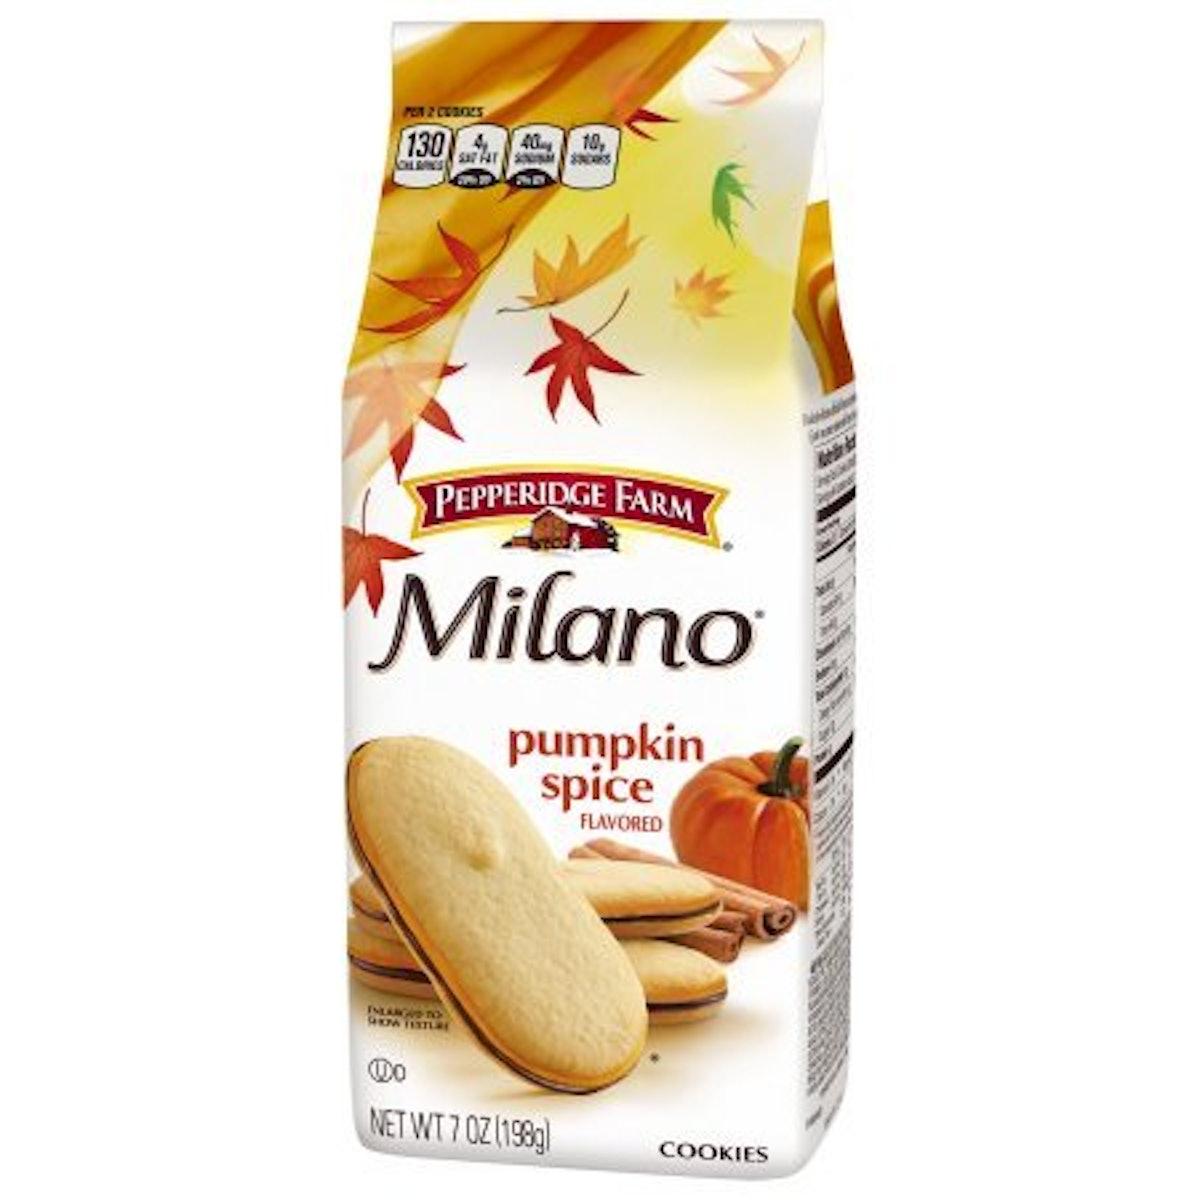 Pepperidge Farm Milano Cookies Seasonal Pumpkin Spice Cookie